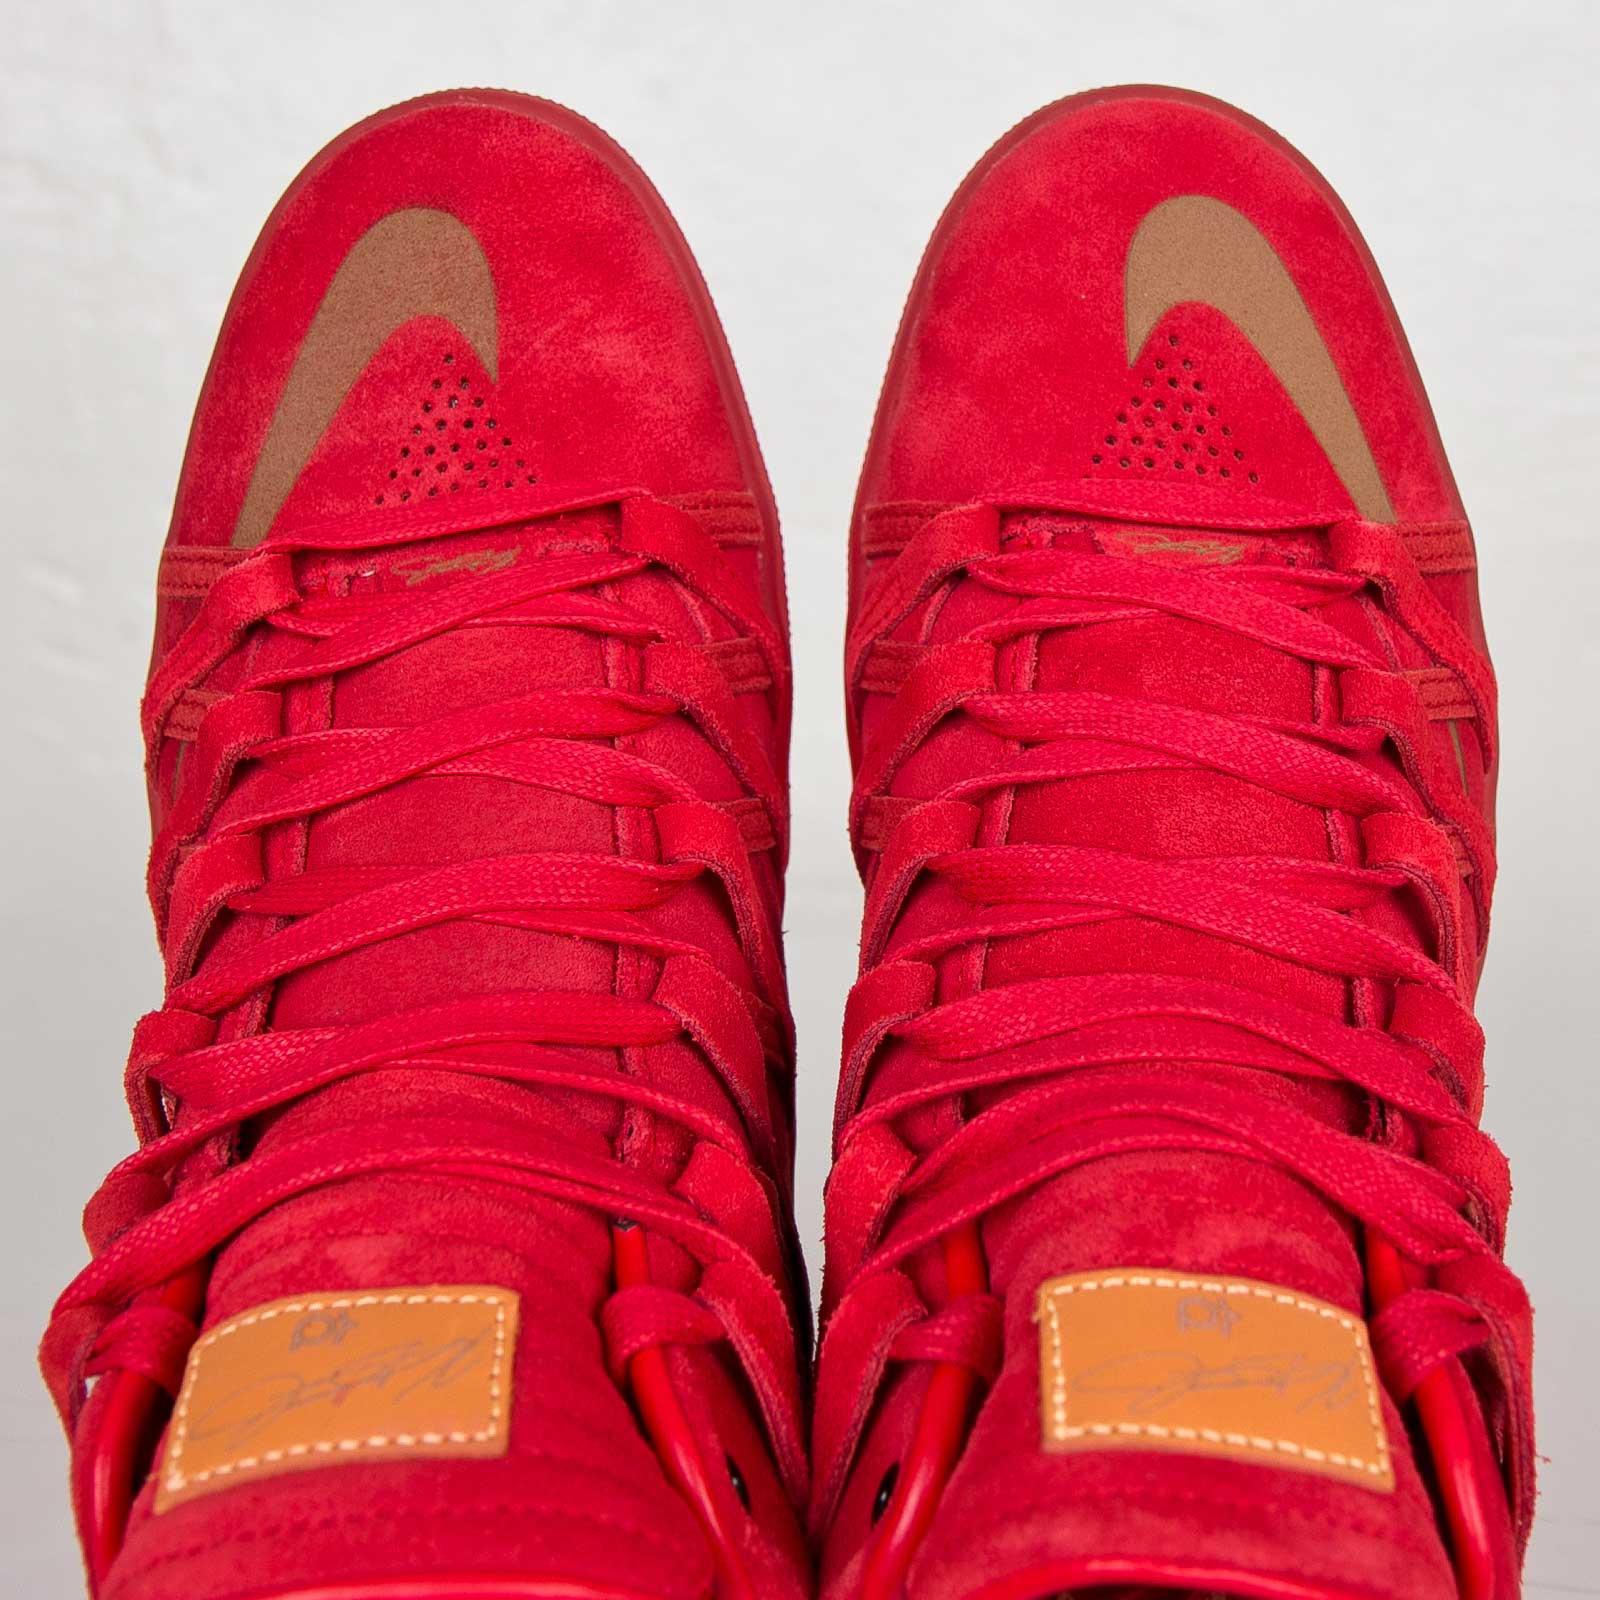 693db58b4e7f Nike KD VII NSW Lifestyle QS - 653871-600 - Sneakersnstuff ...